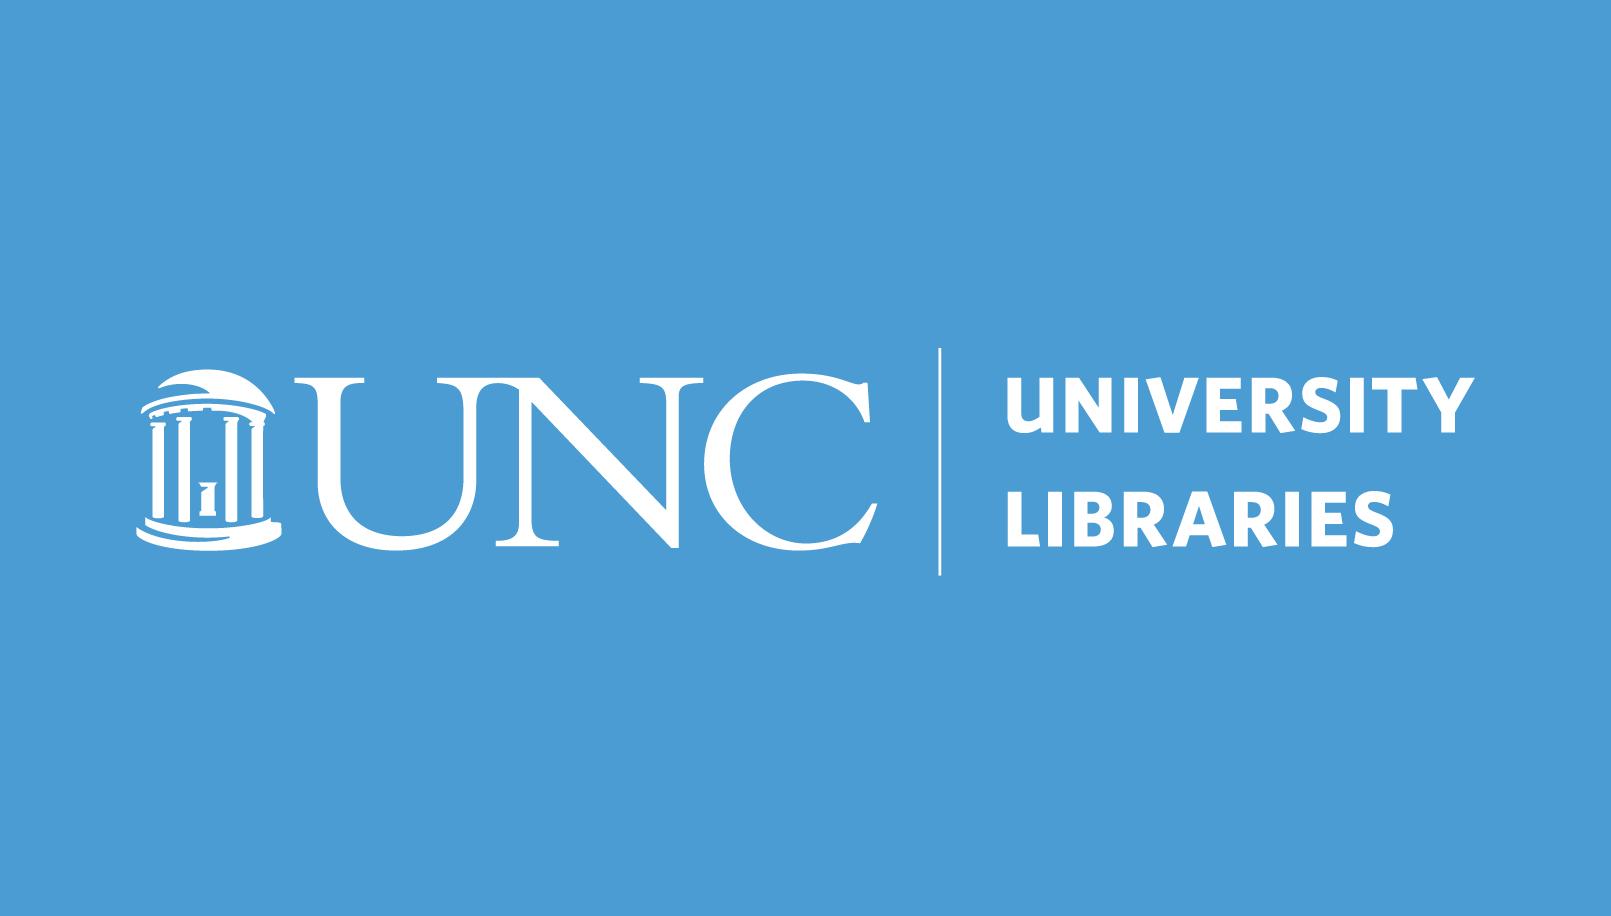 The University of North Carolina University Libraries Logo